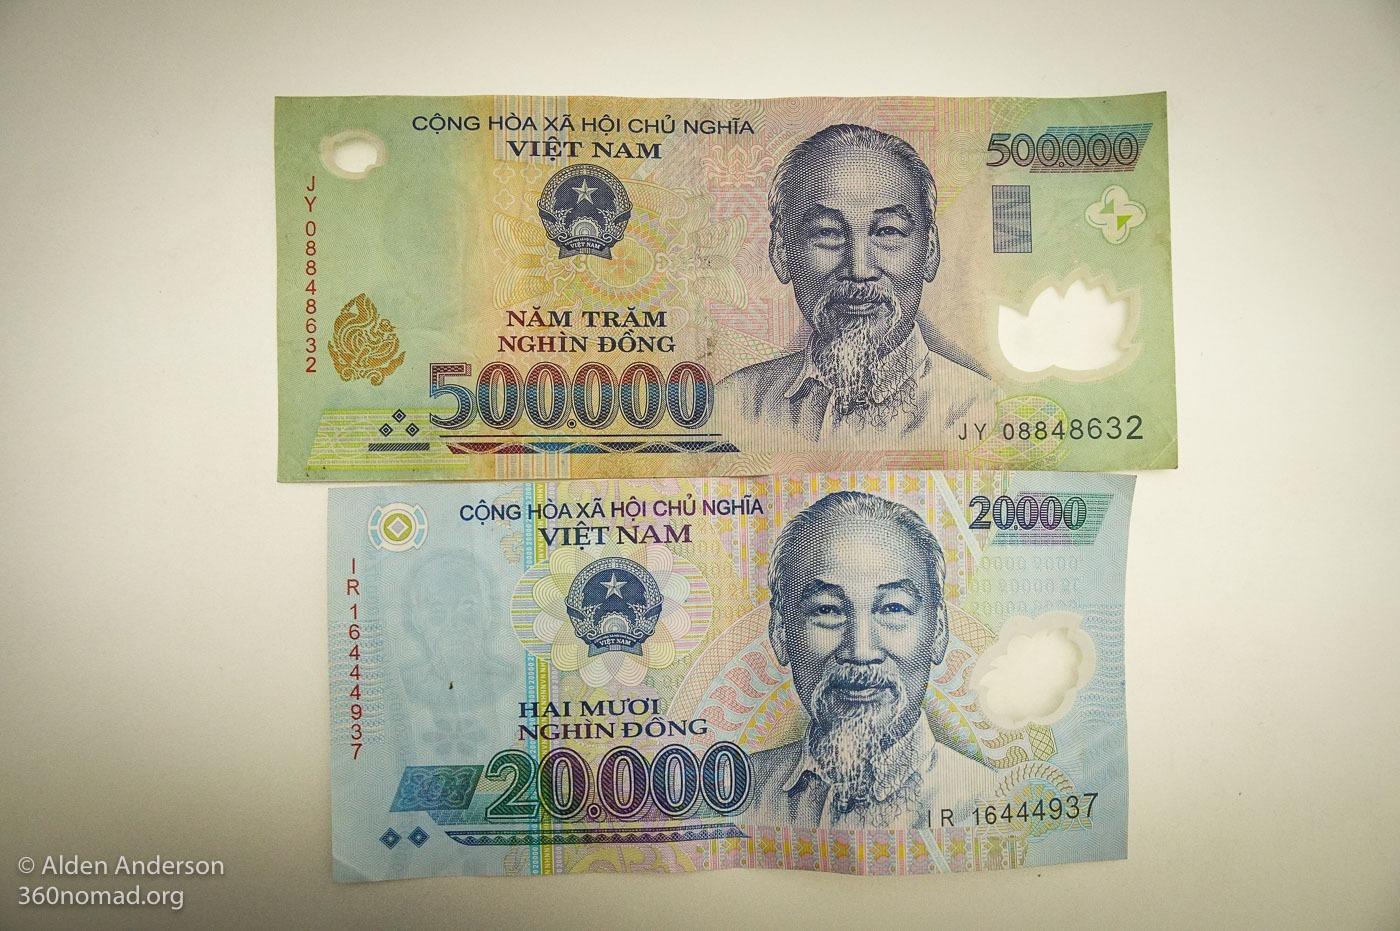 Vietnam Money 360nomad org - 360nomad